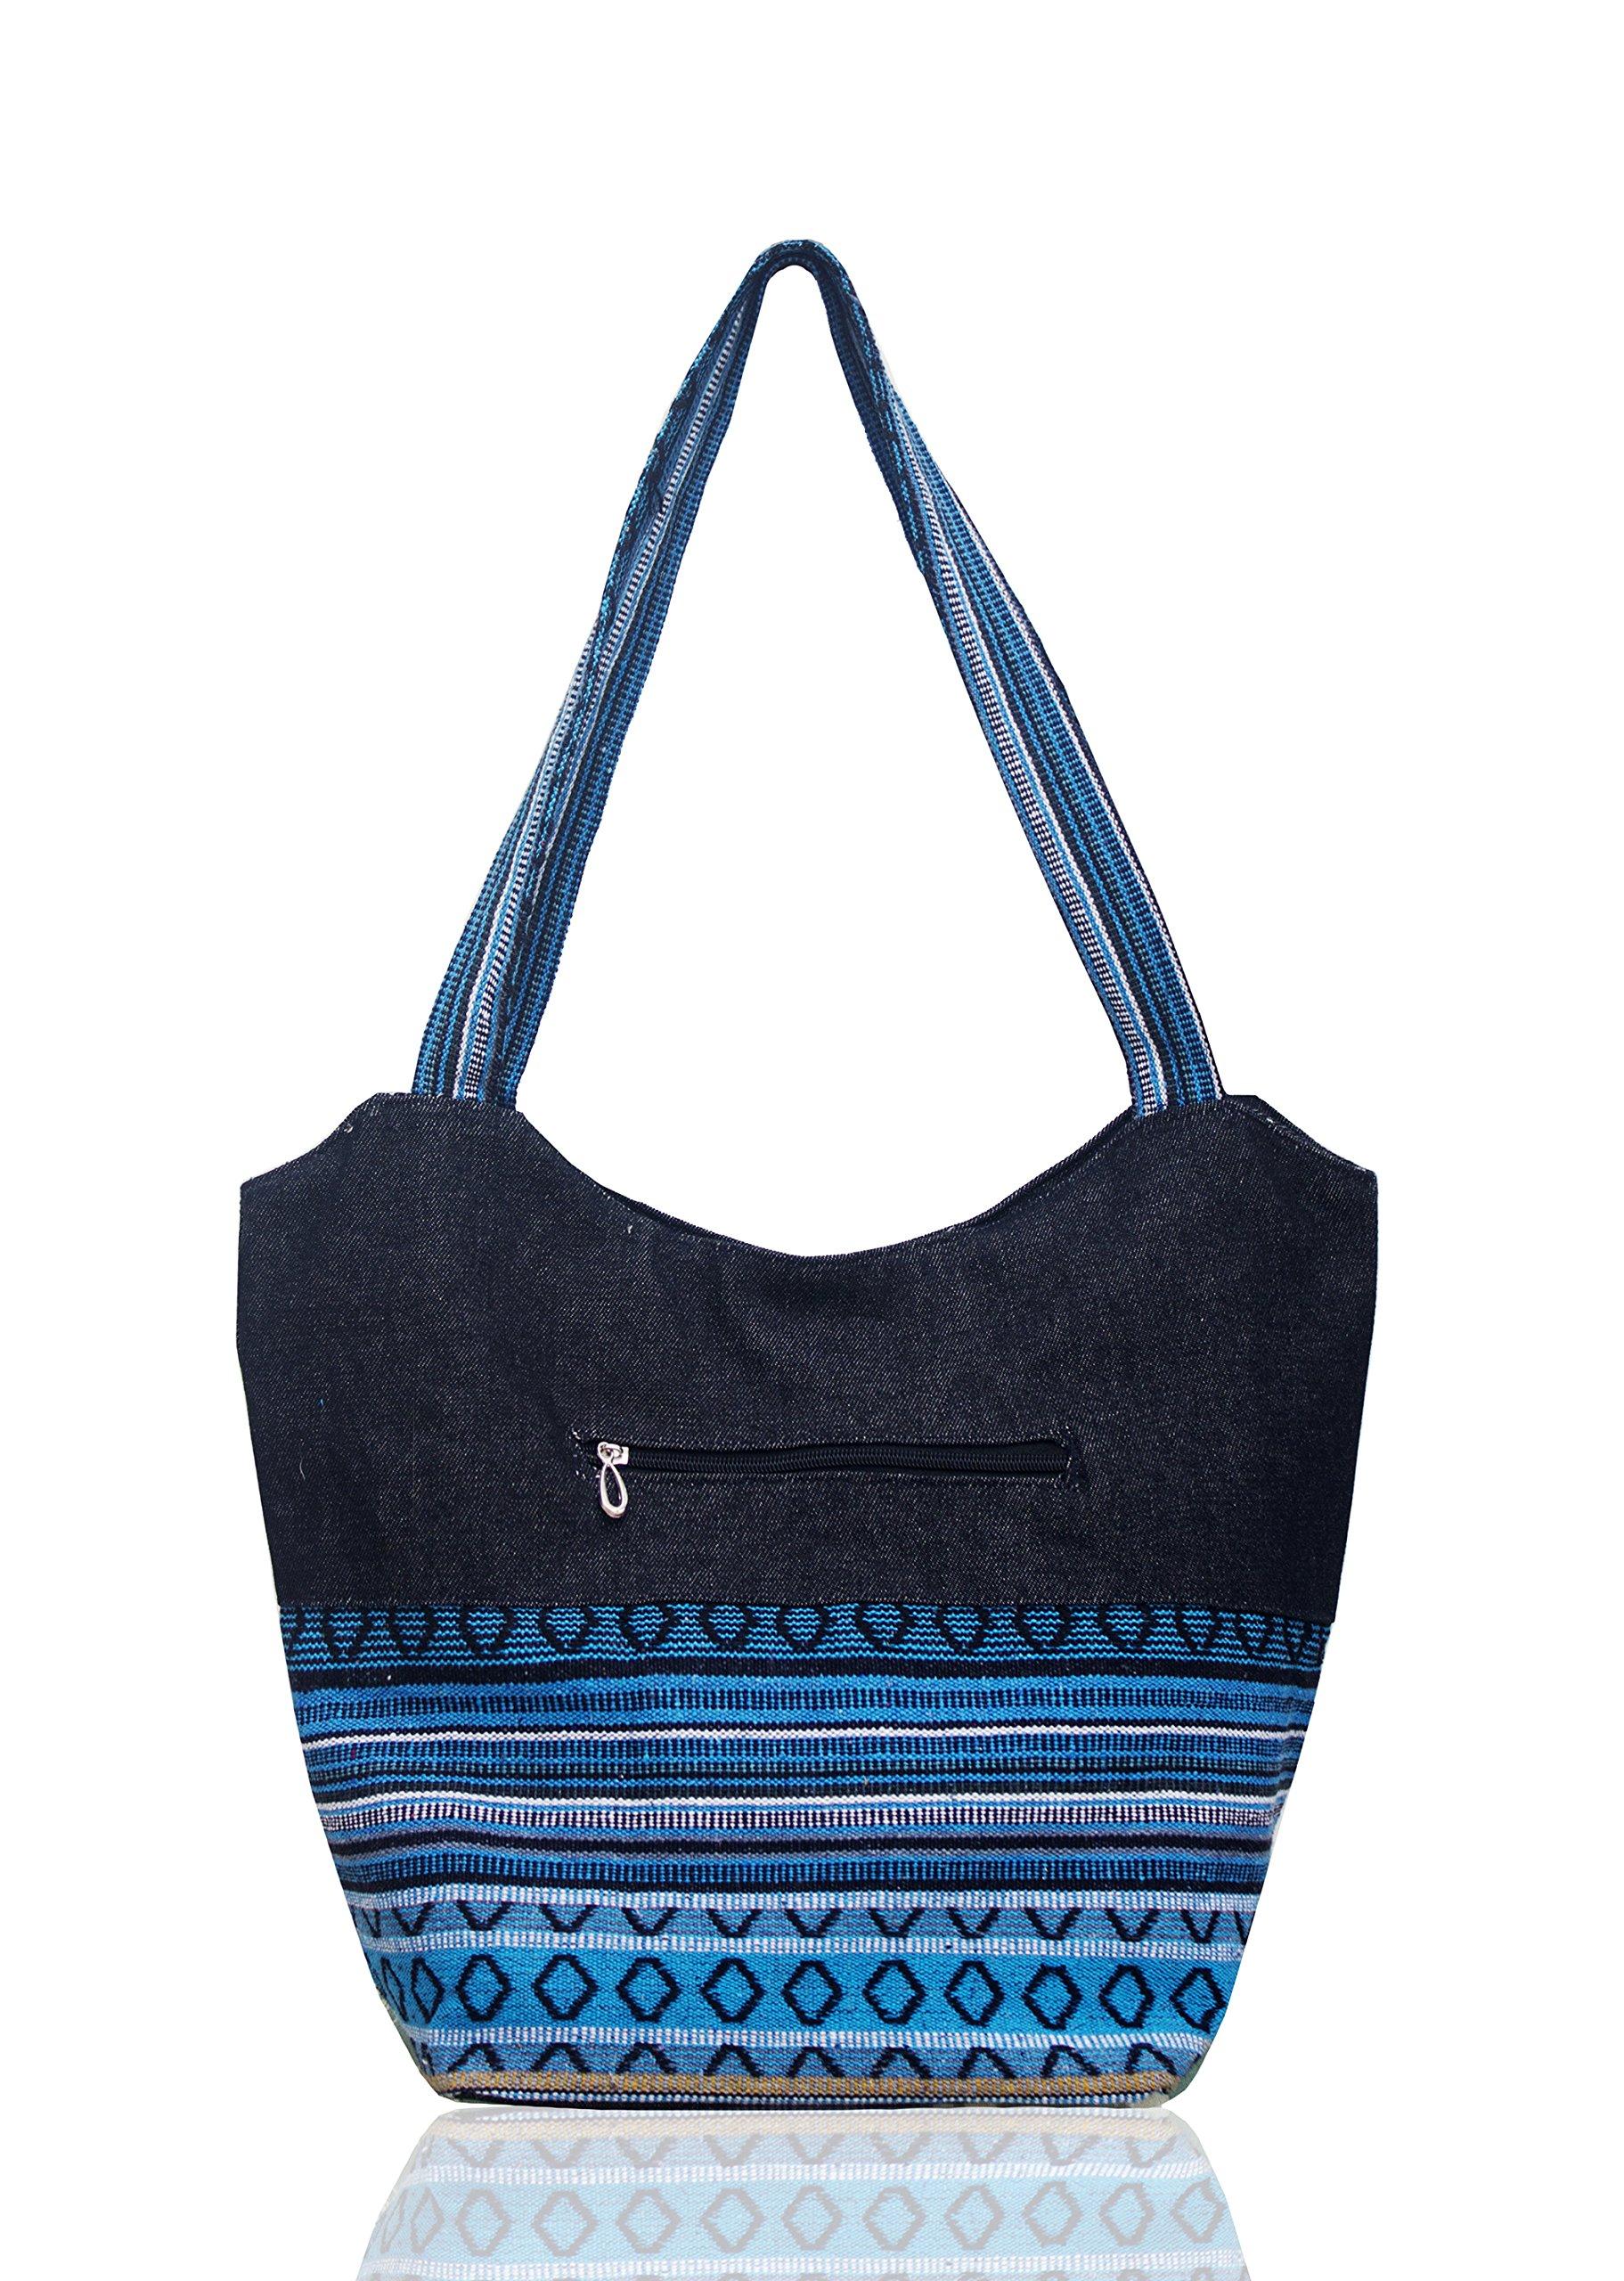 Handmade Tote travel work shopper large capacity shoulder top handle bags for women girl (Summer Sky Blue)